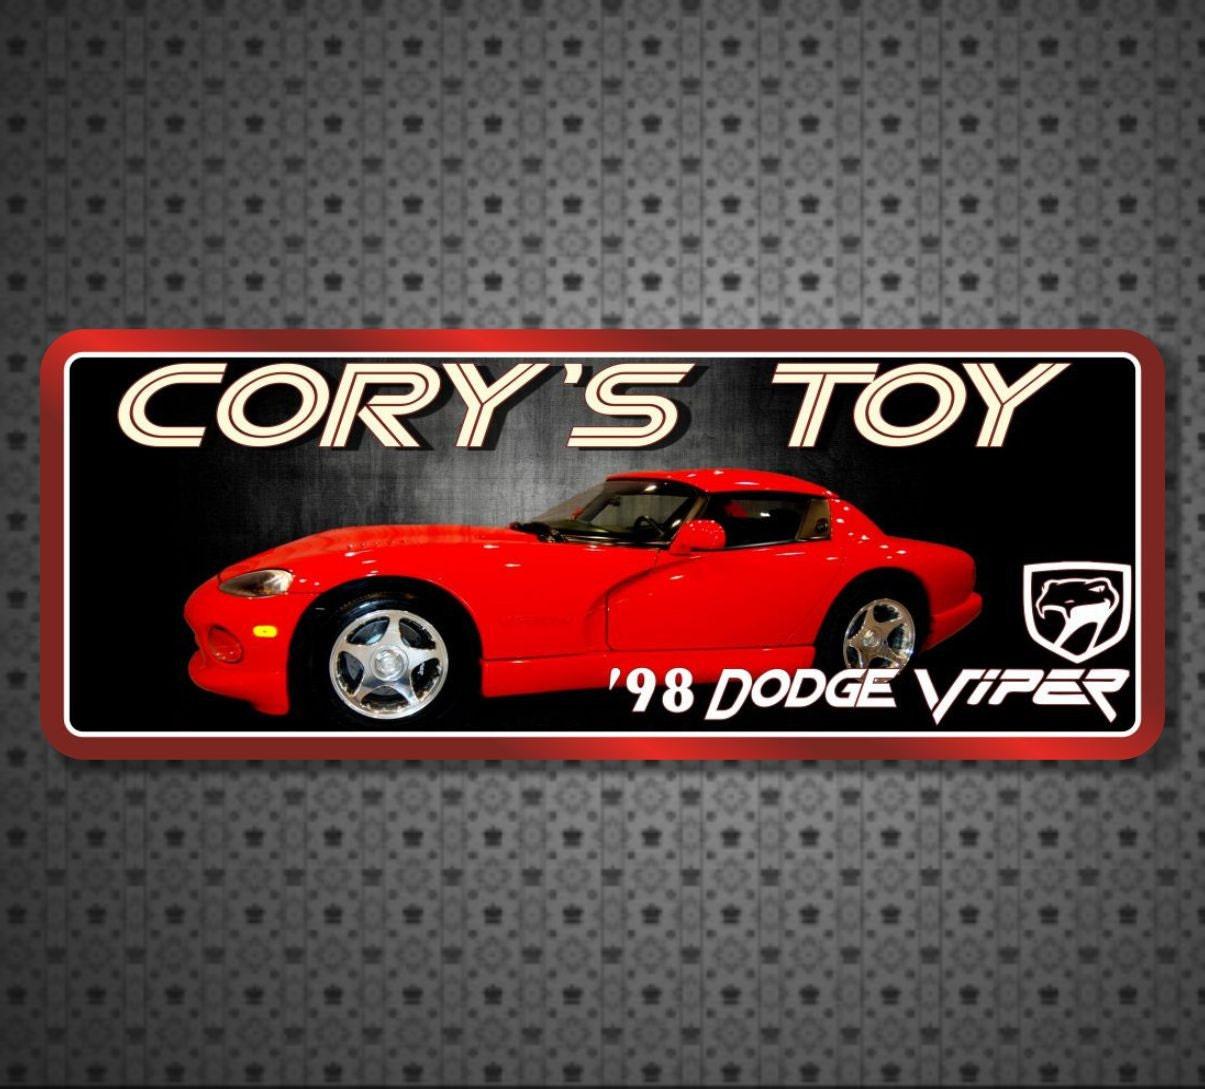 Custom Car Garage Signs : Custom sign car garage man cave muscle personalized name c